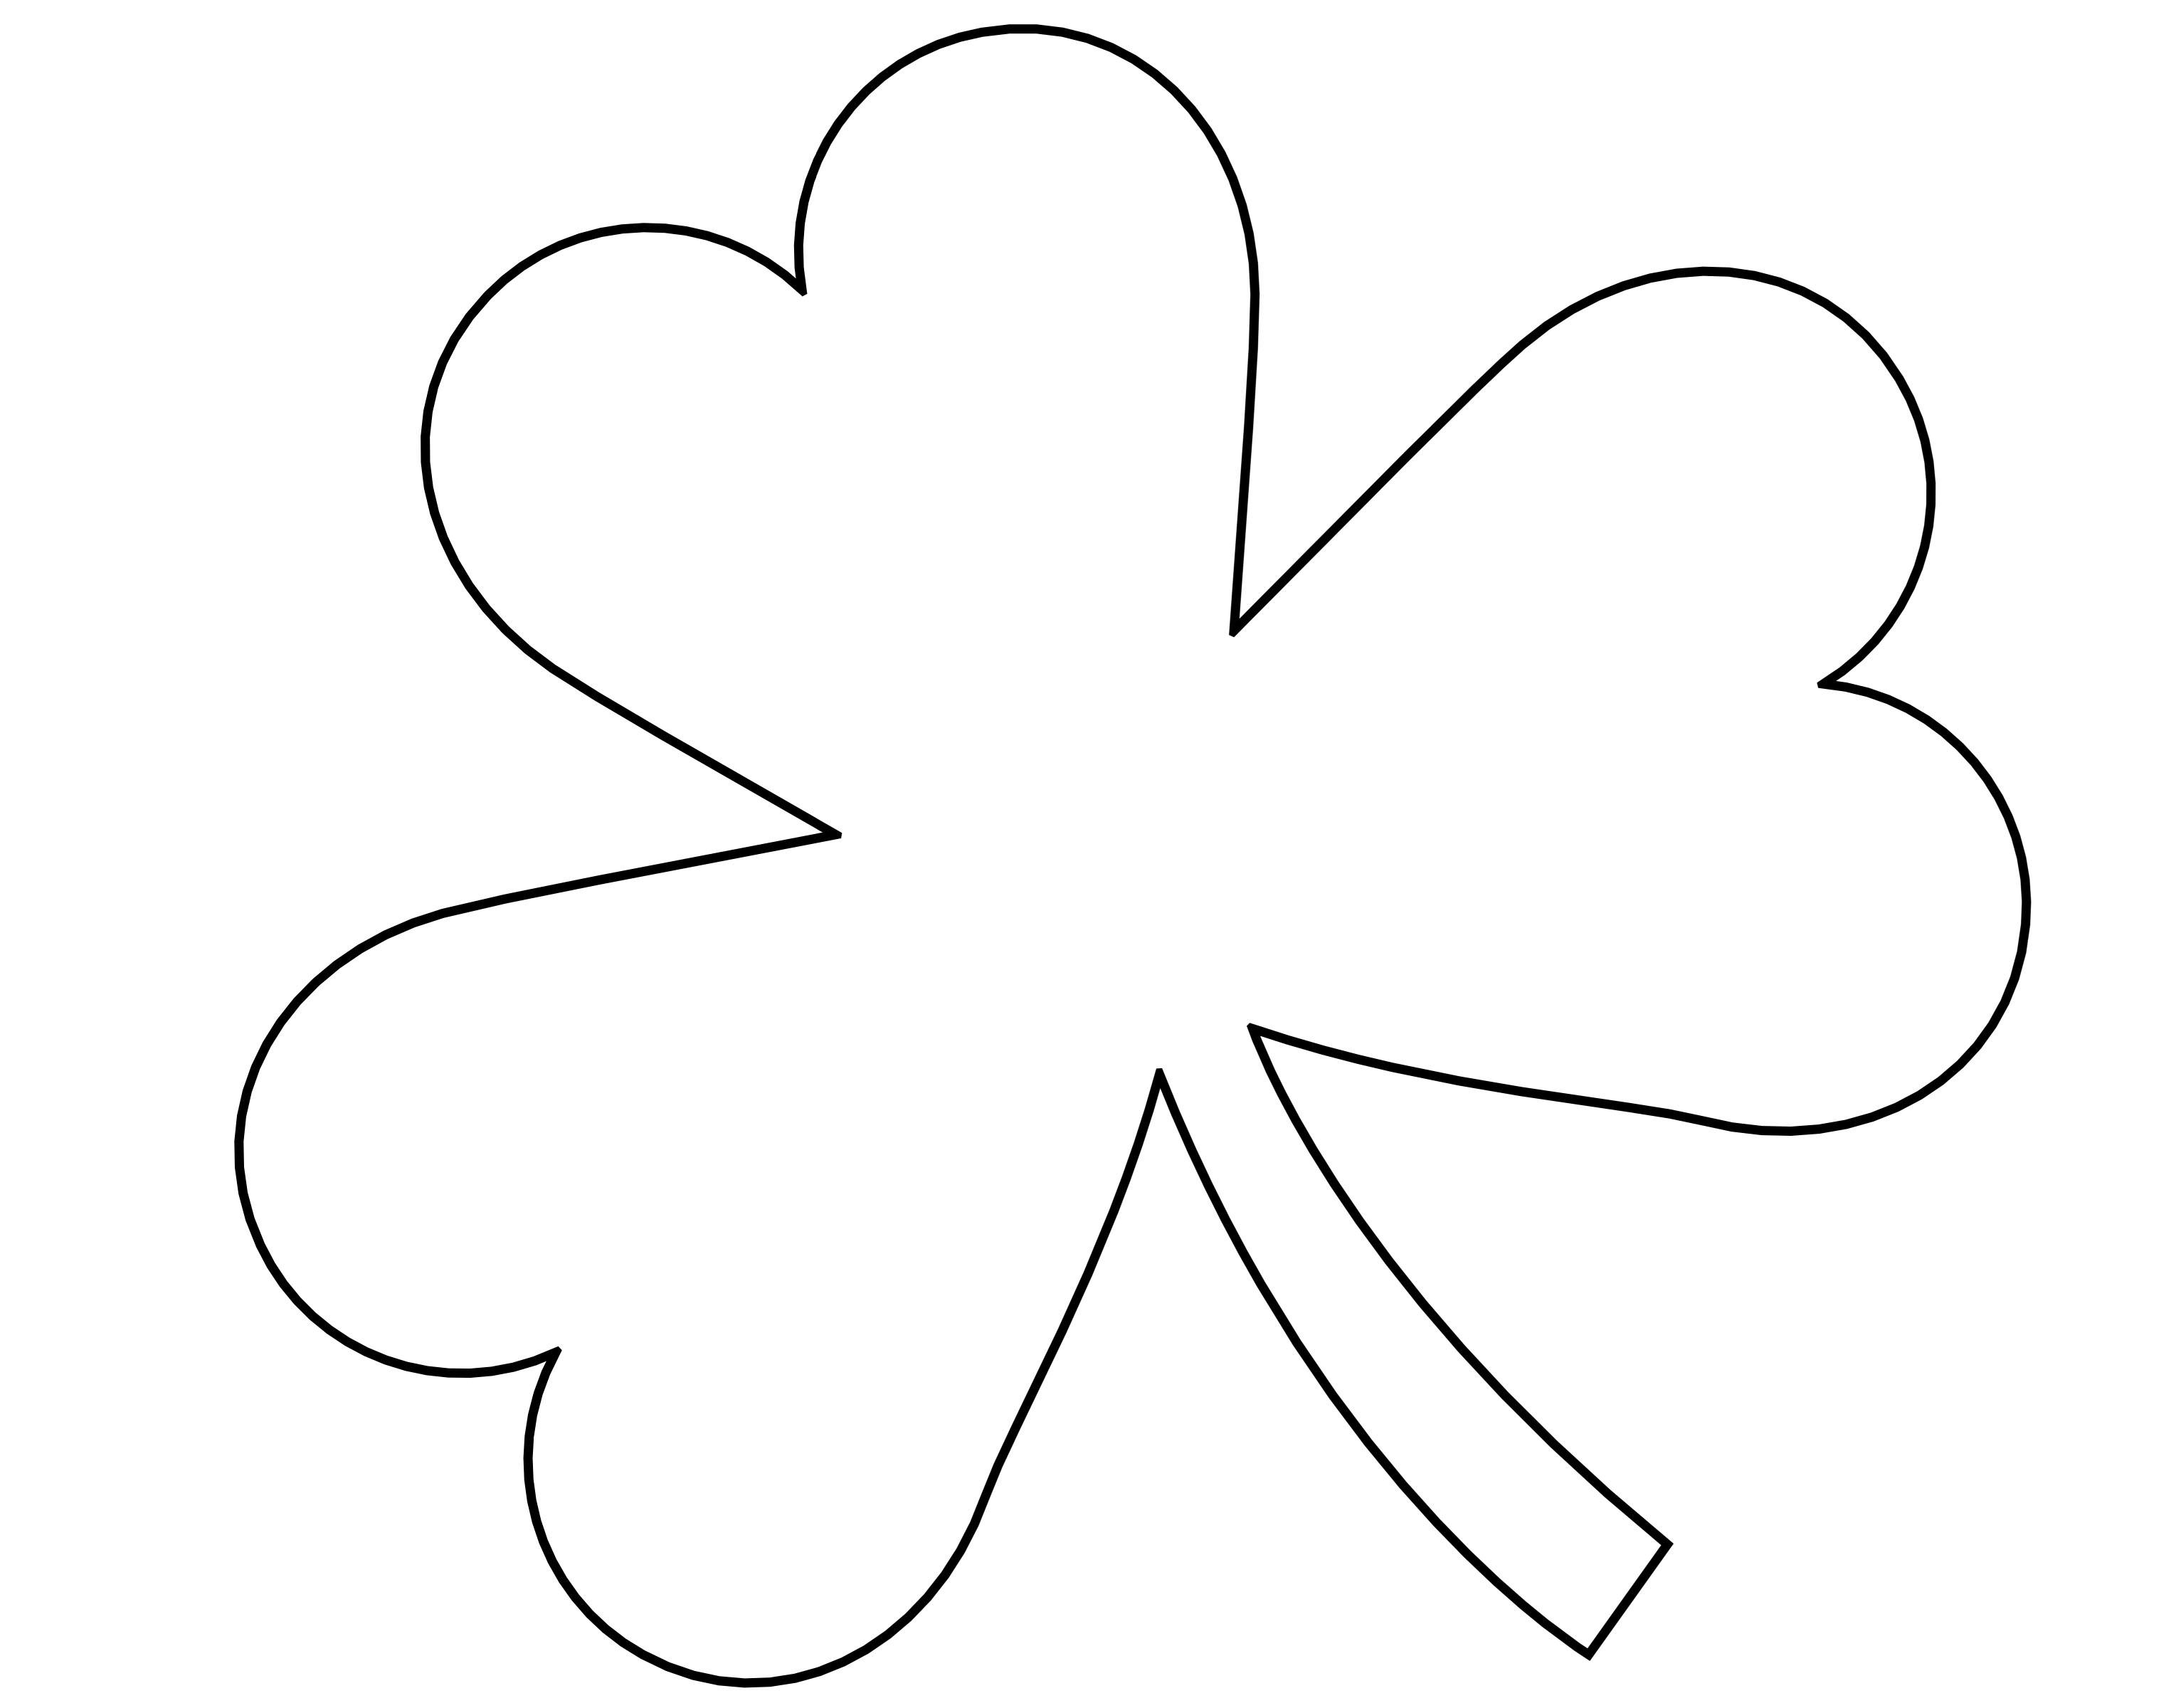 printable 4 leaf clover four leaf clover vector clip art at clkercom vector 4 printable leaf clover